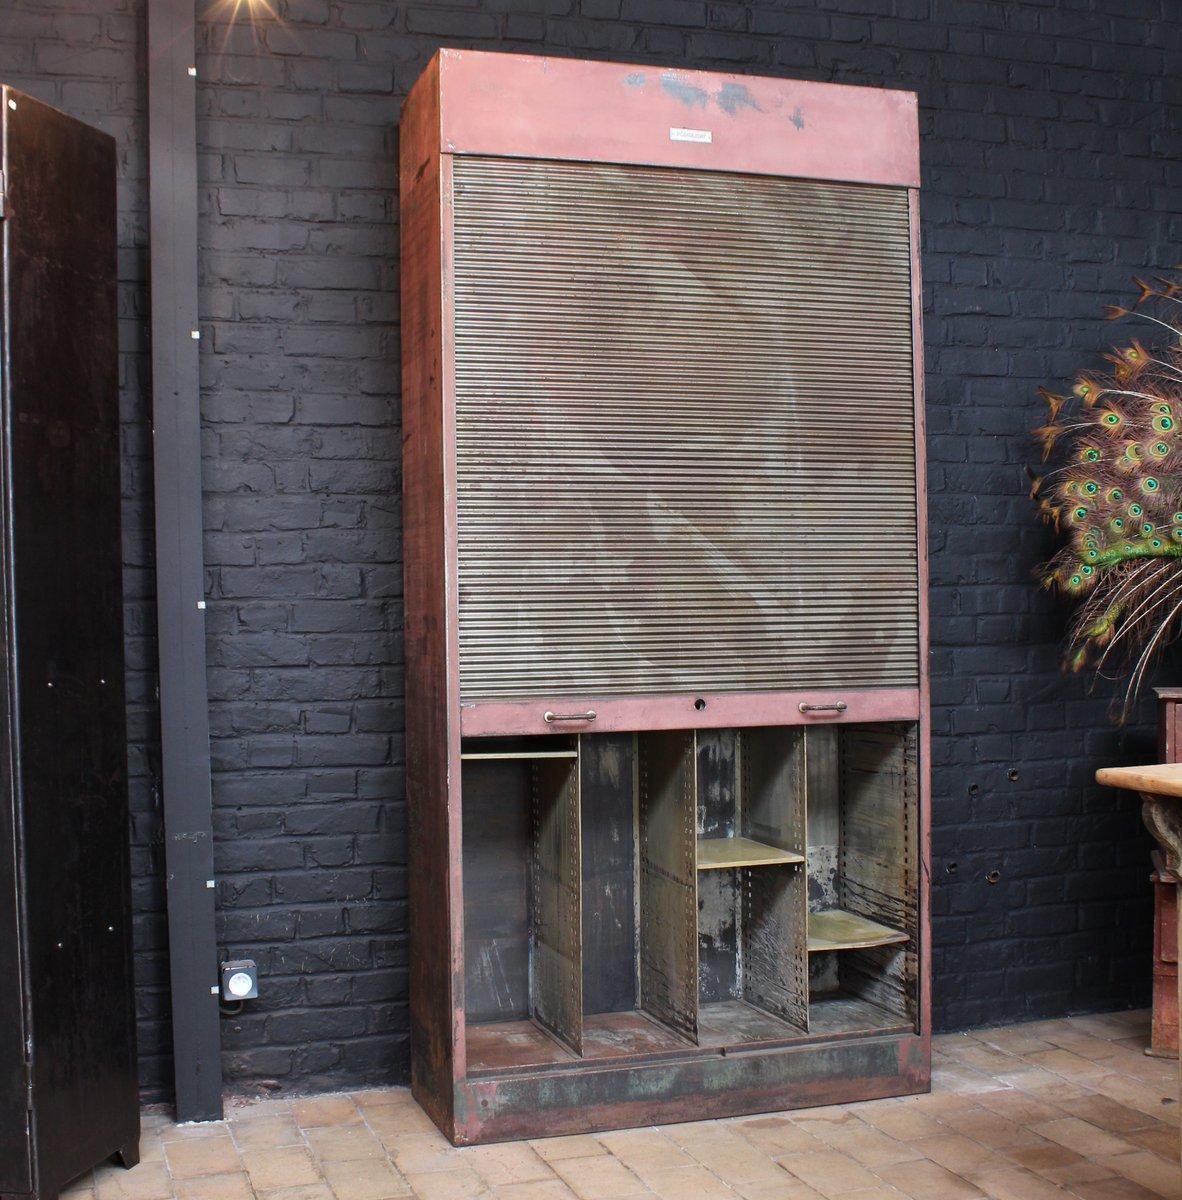 armoire industrielle m tallique luq86 slabtownrib. Black Bedroom Furniture Sets. Home Design Ideas